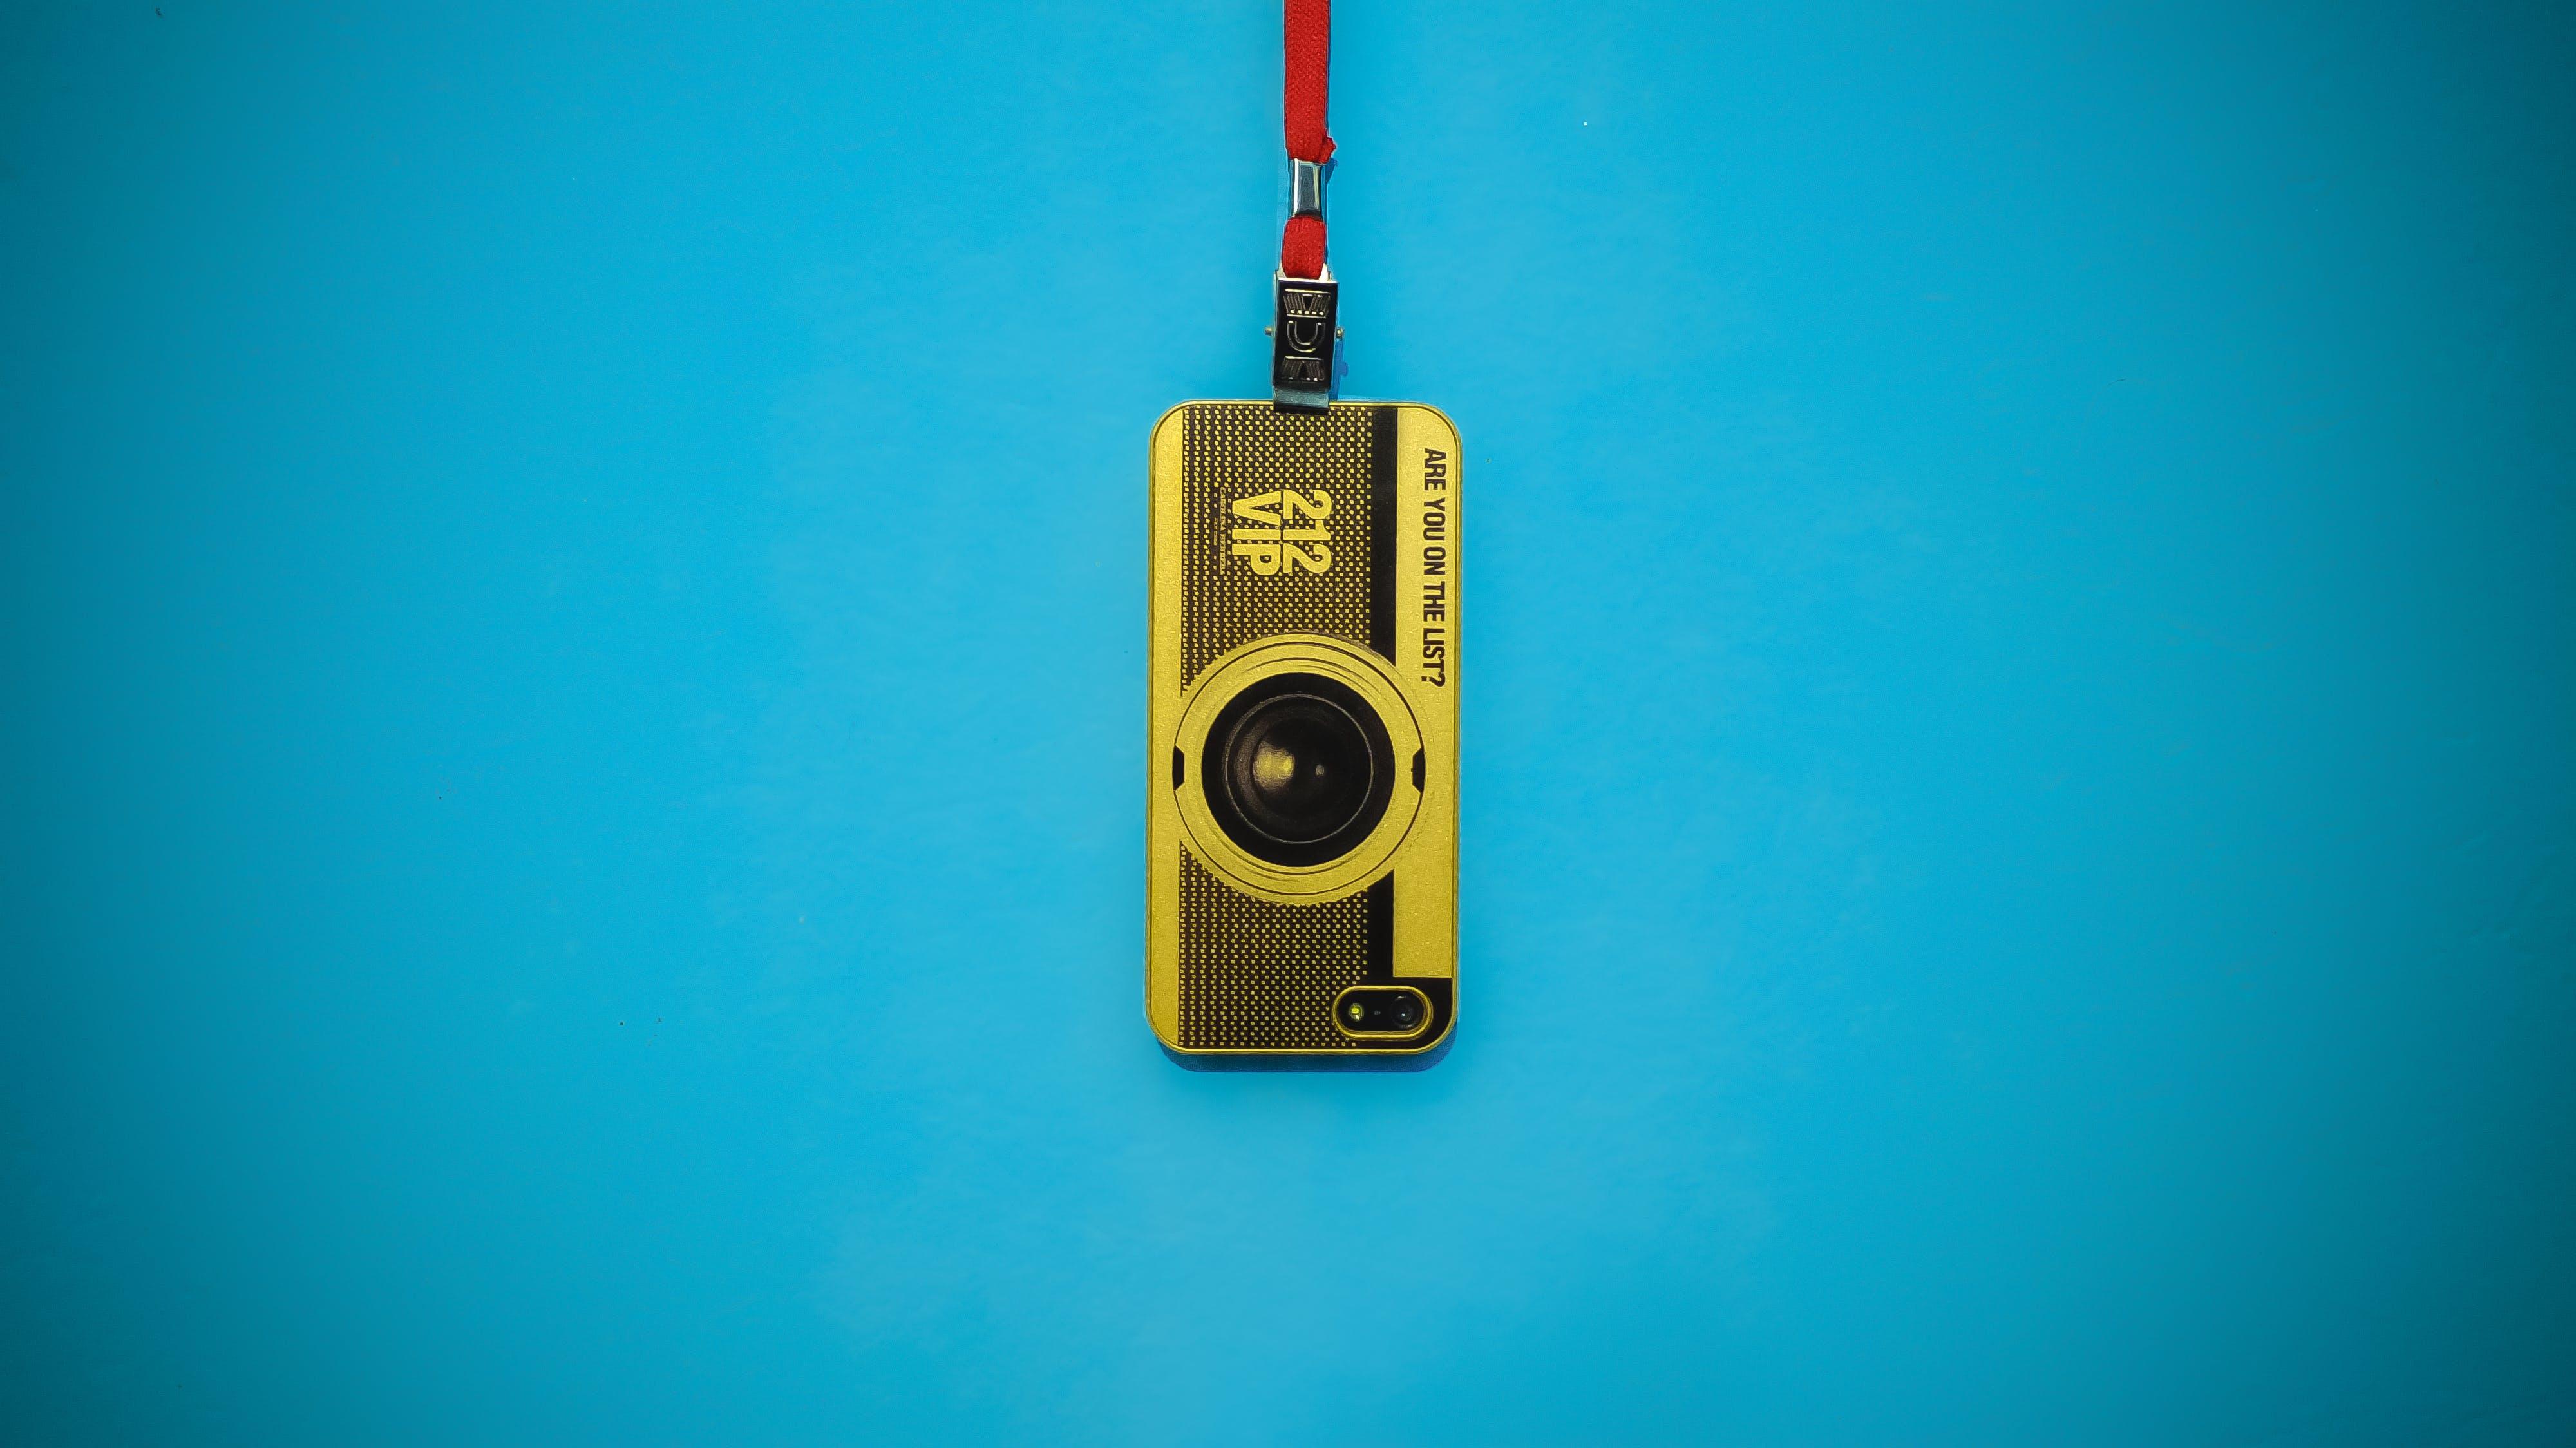 Yellow 212 Vip Camera Hanging on Blue Wall